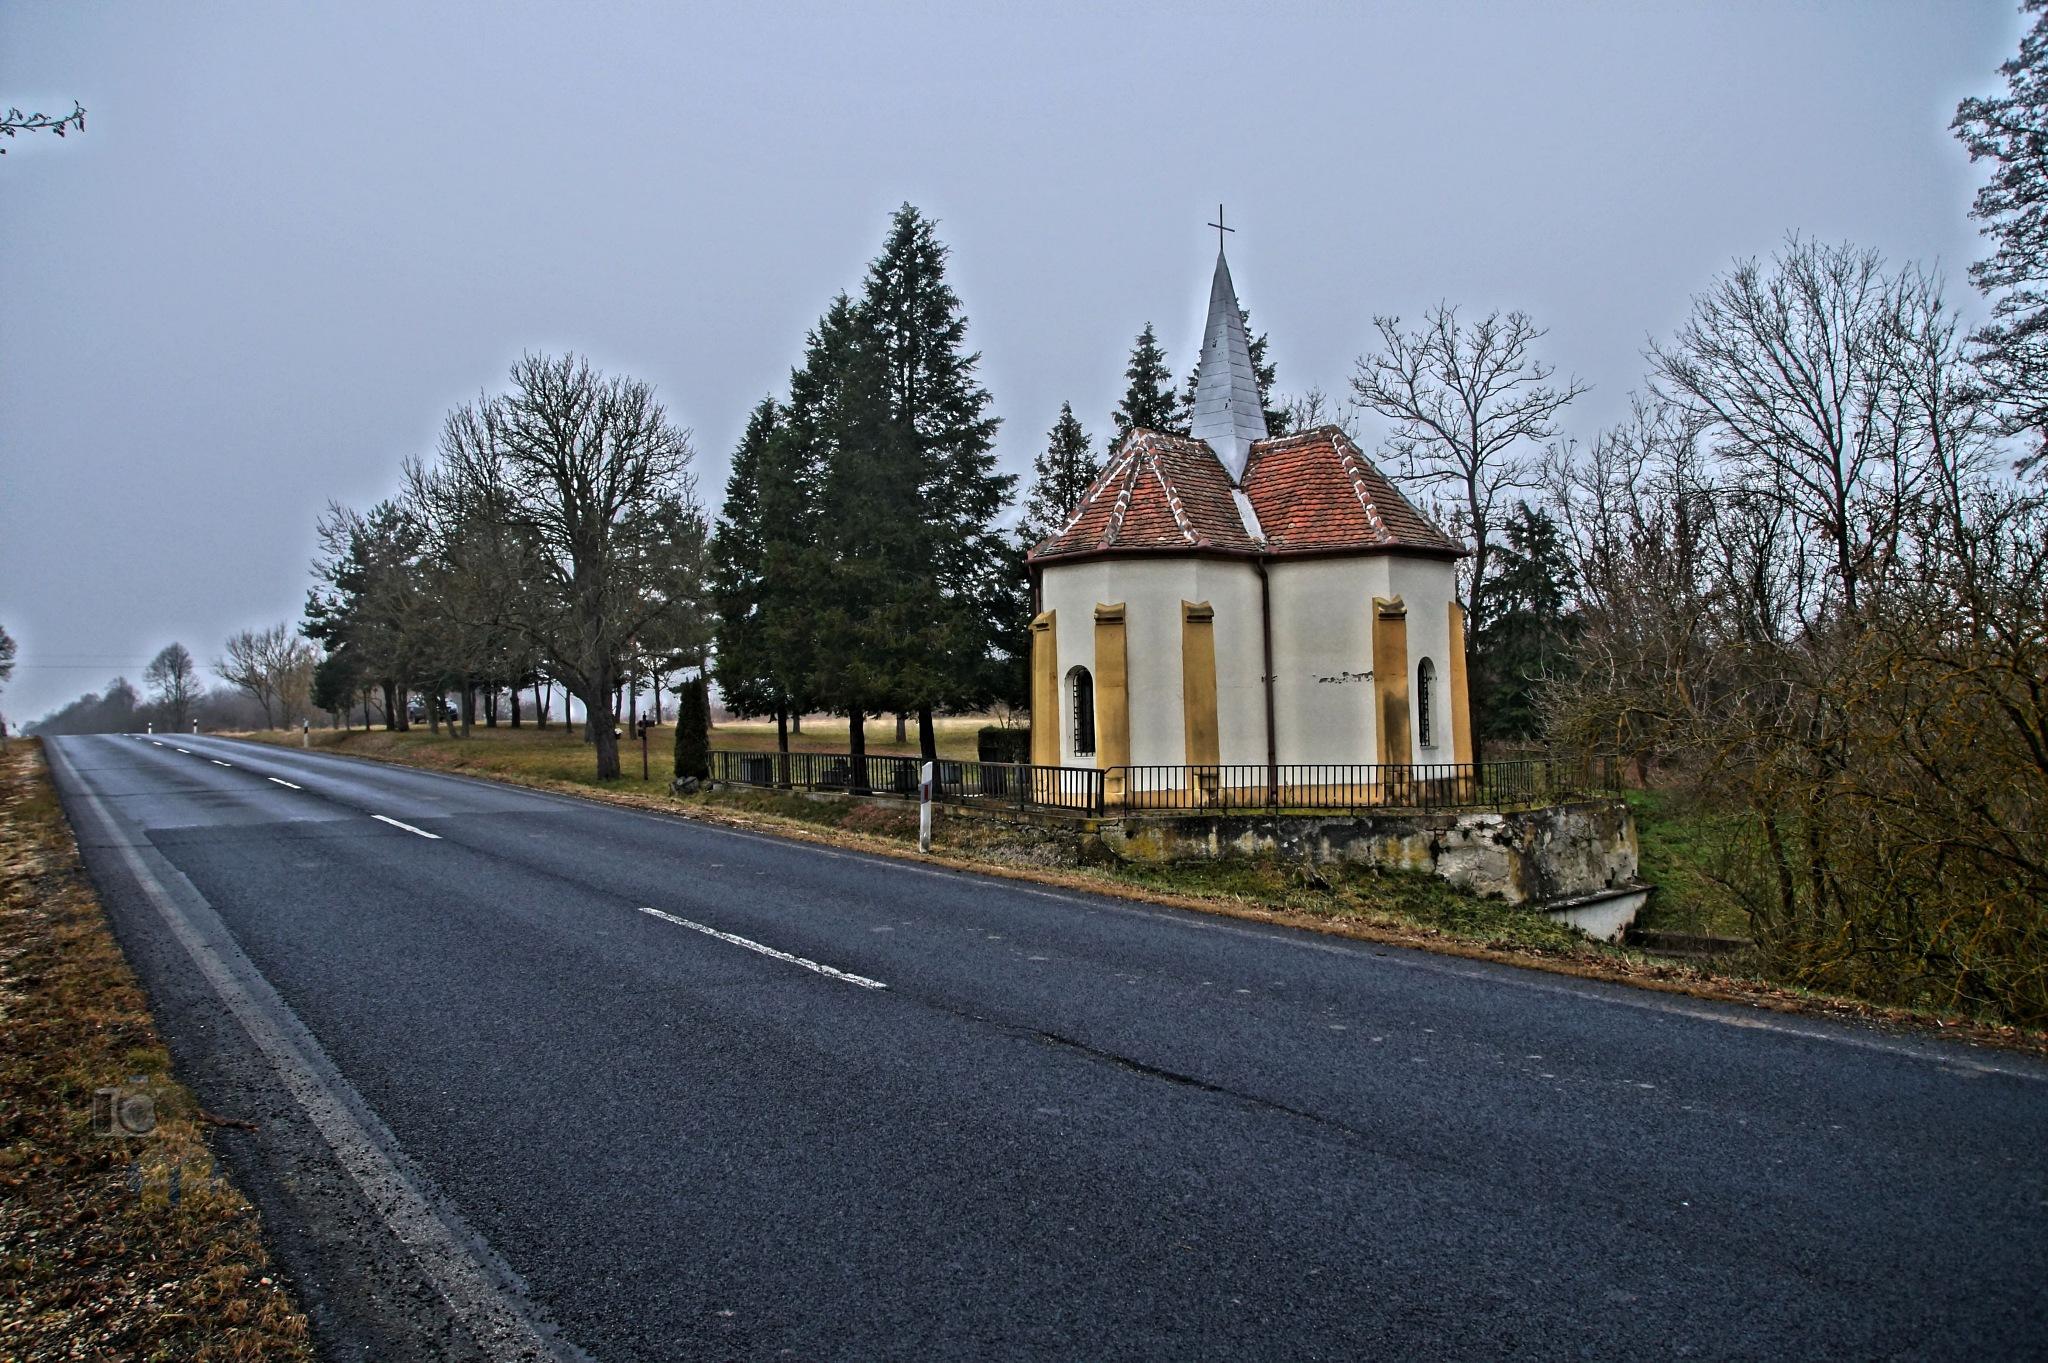 Dec.23, Old Chapel of St. Stephen near the road by hunyadigeza